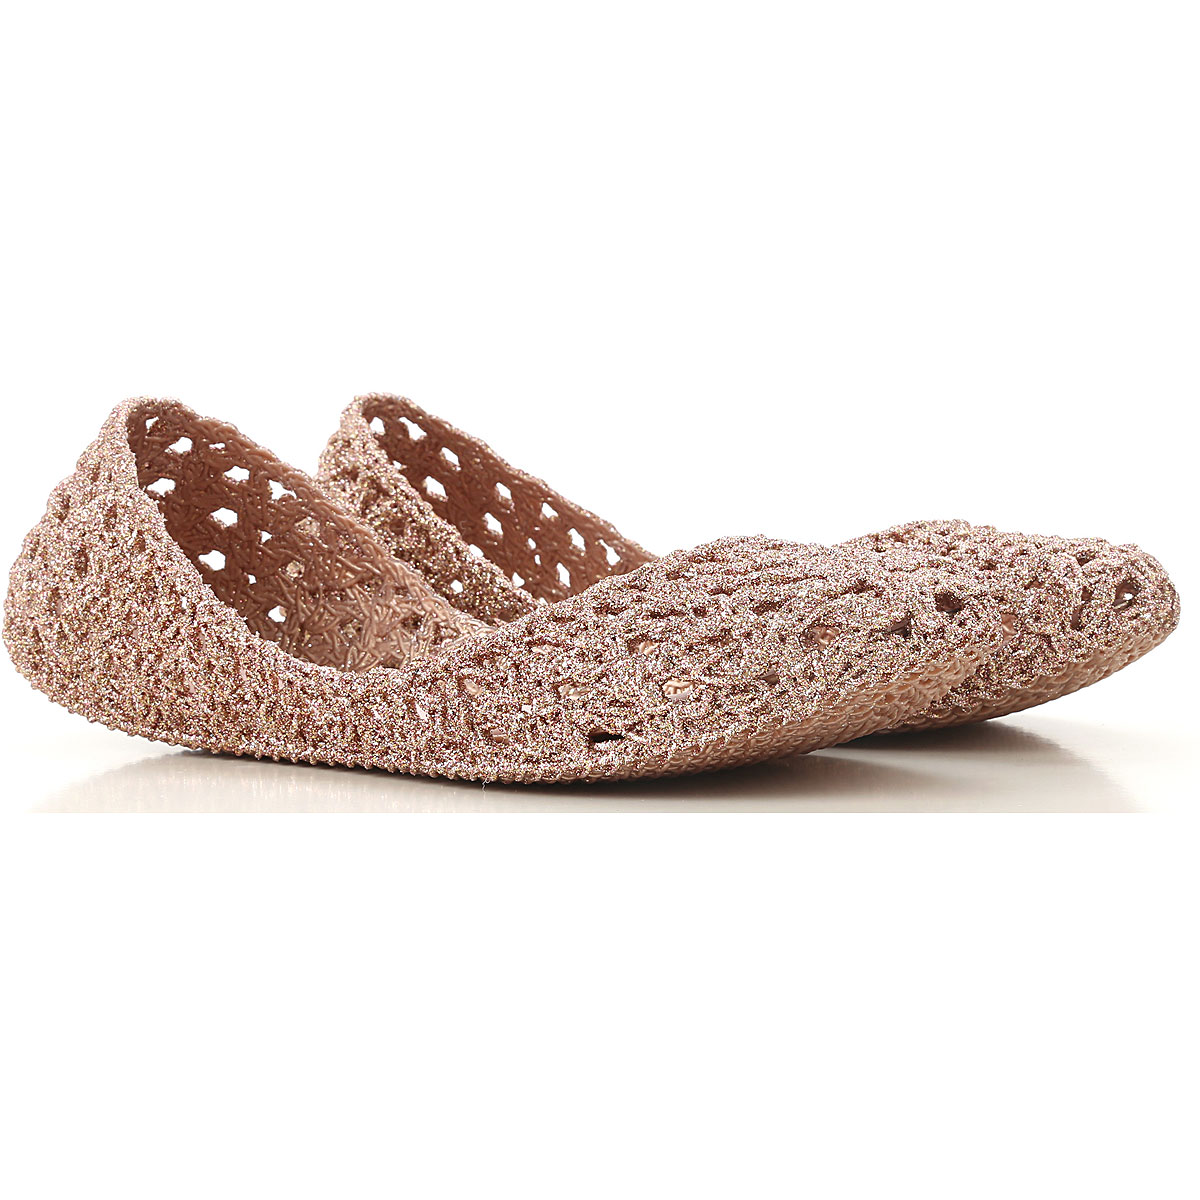 Melissa Ballet Flats Ballerina Shoes for Women On Sale, Melissa / Campana, Glitter Pink, PVC, 2019, USA 5 - EUR 35/36 USA 6 - EUR 37 USA 7 - EUR 38 US